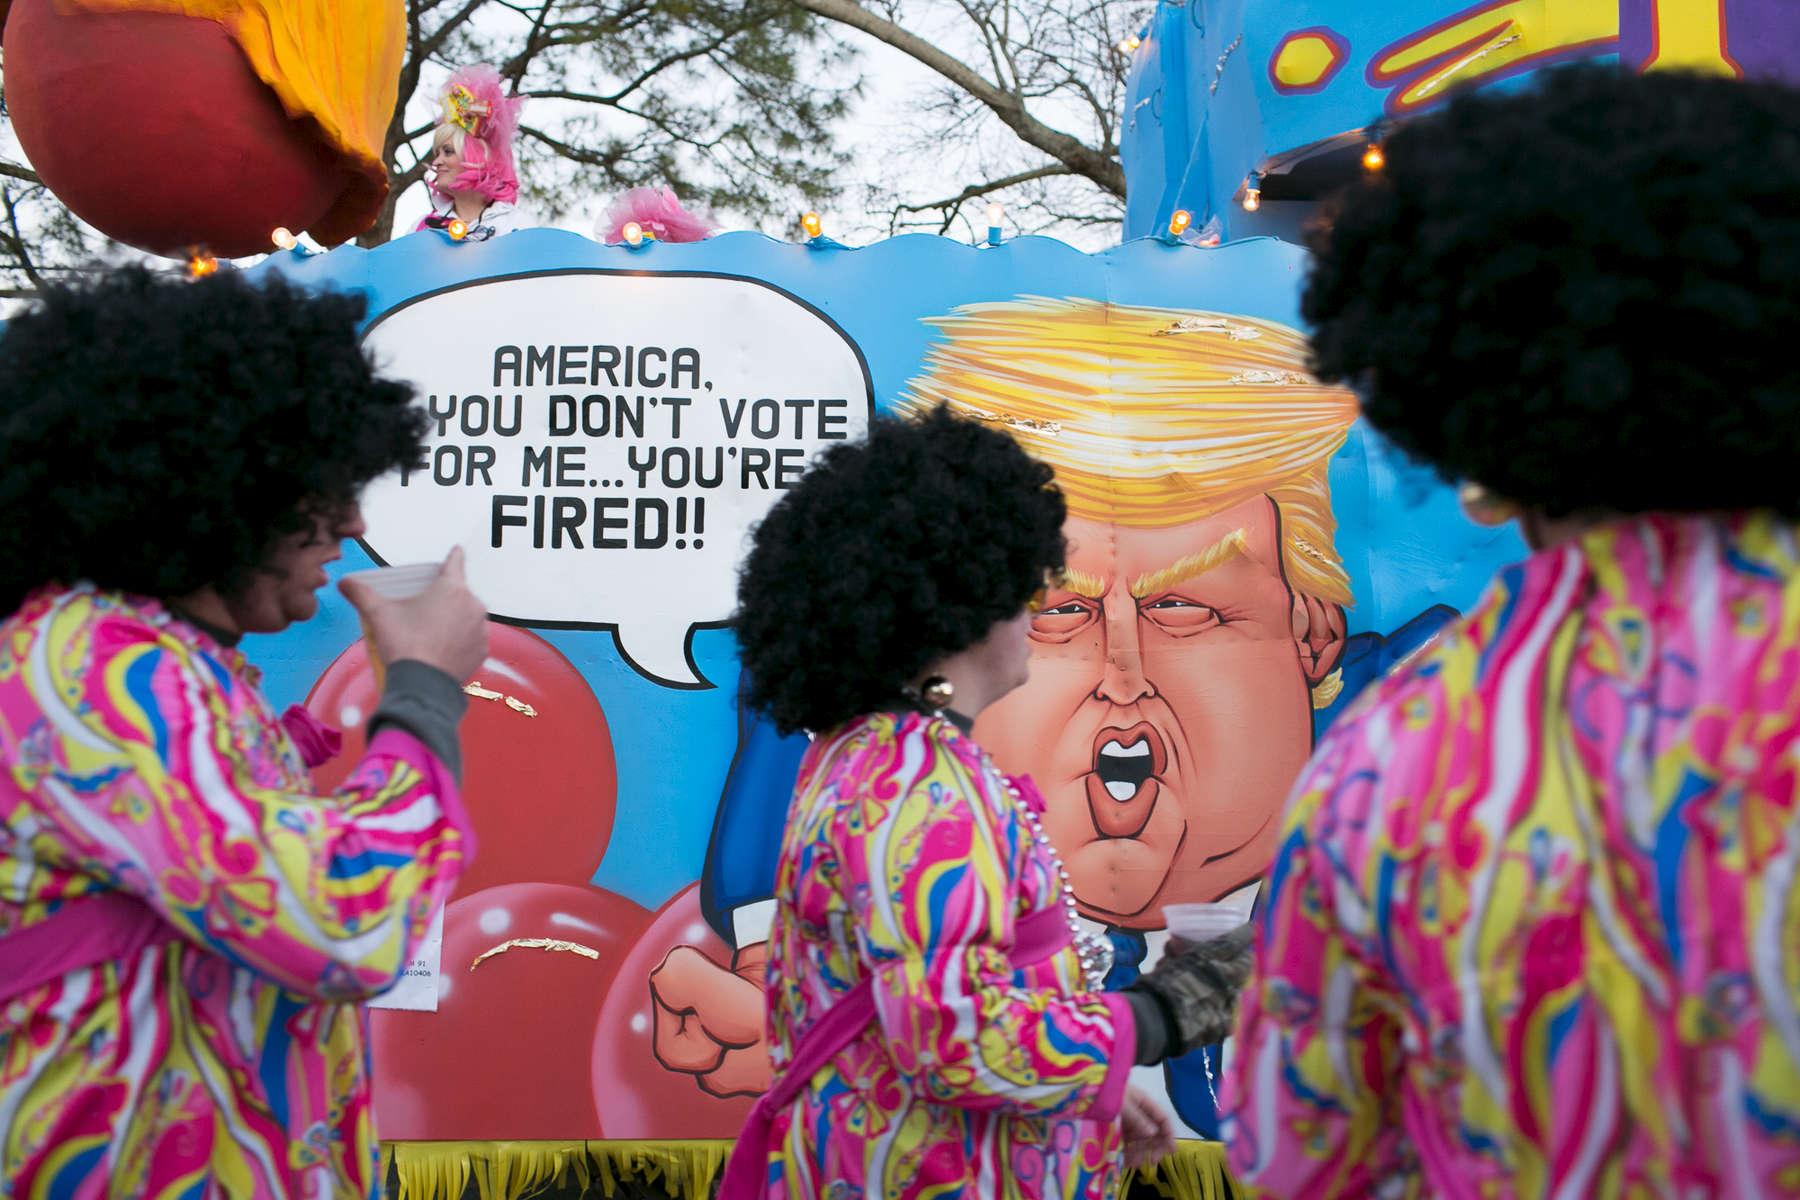 Mardi Gras 2016 on February 4, 2016.